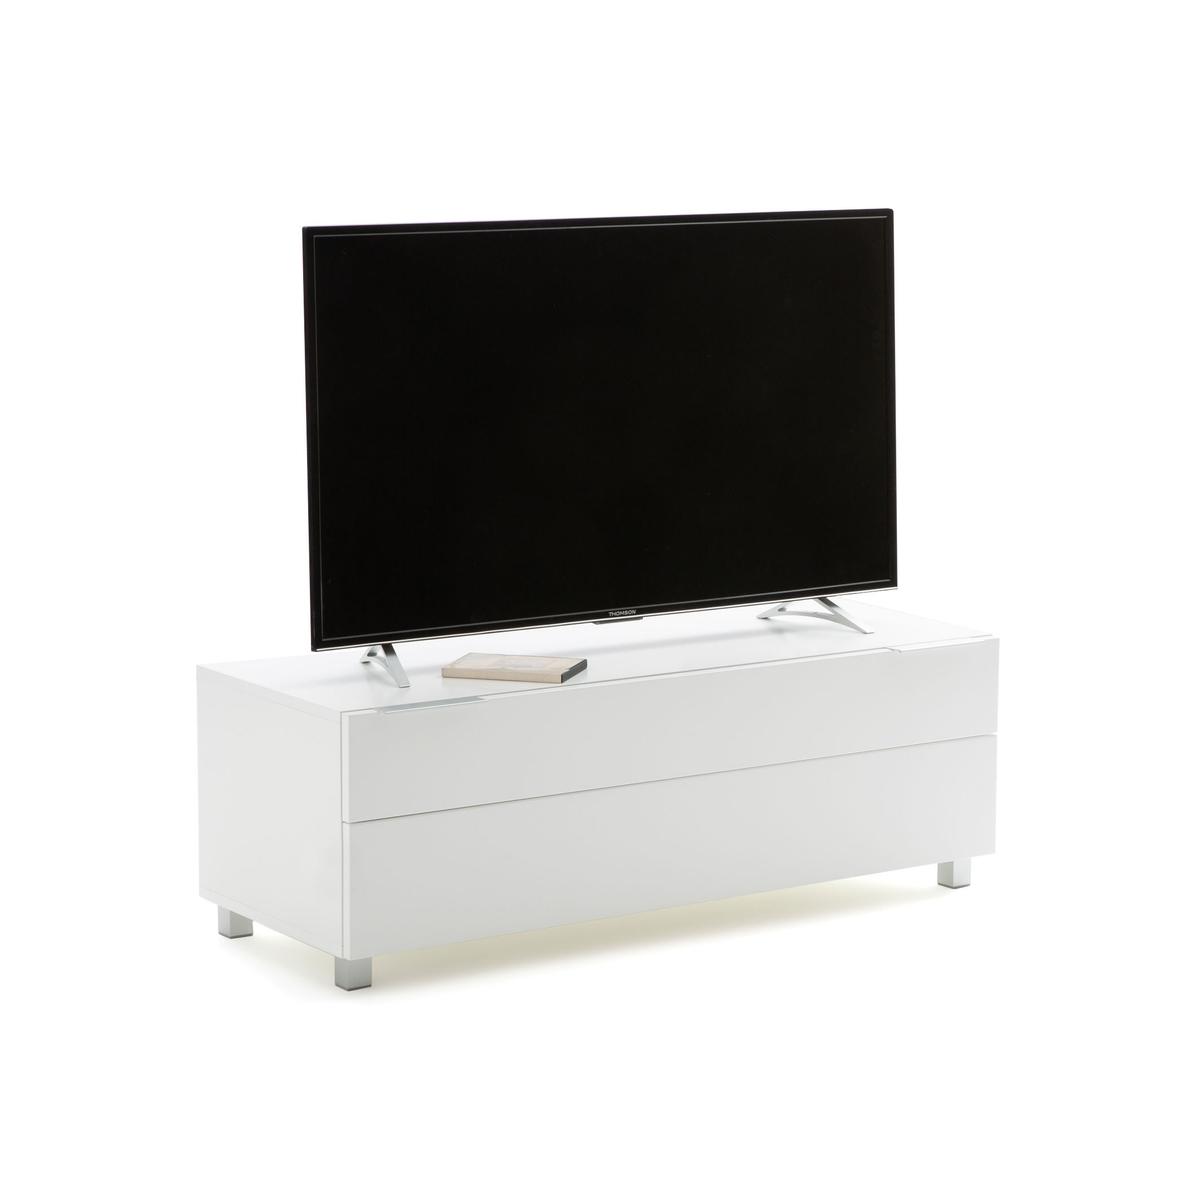 Подставка La Redoute Для TV дизайн high gloss Newark единый размер белый